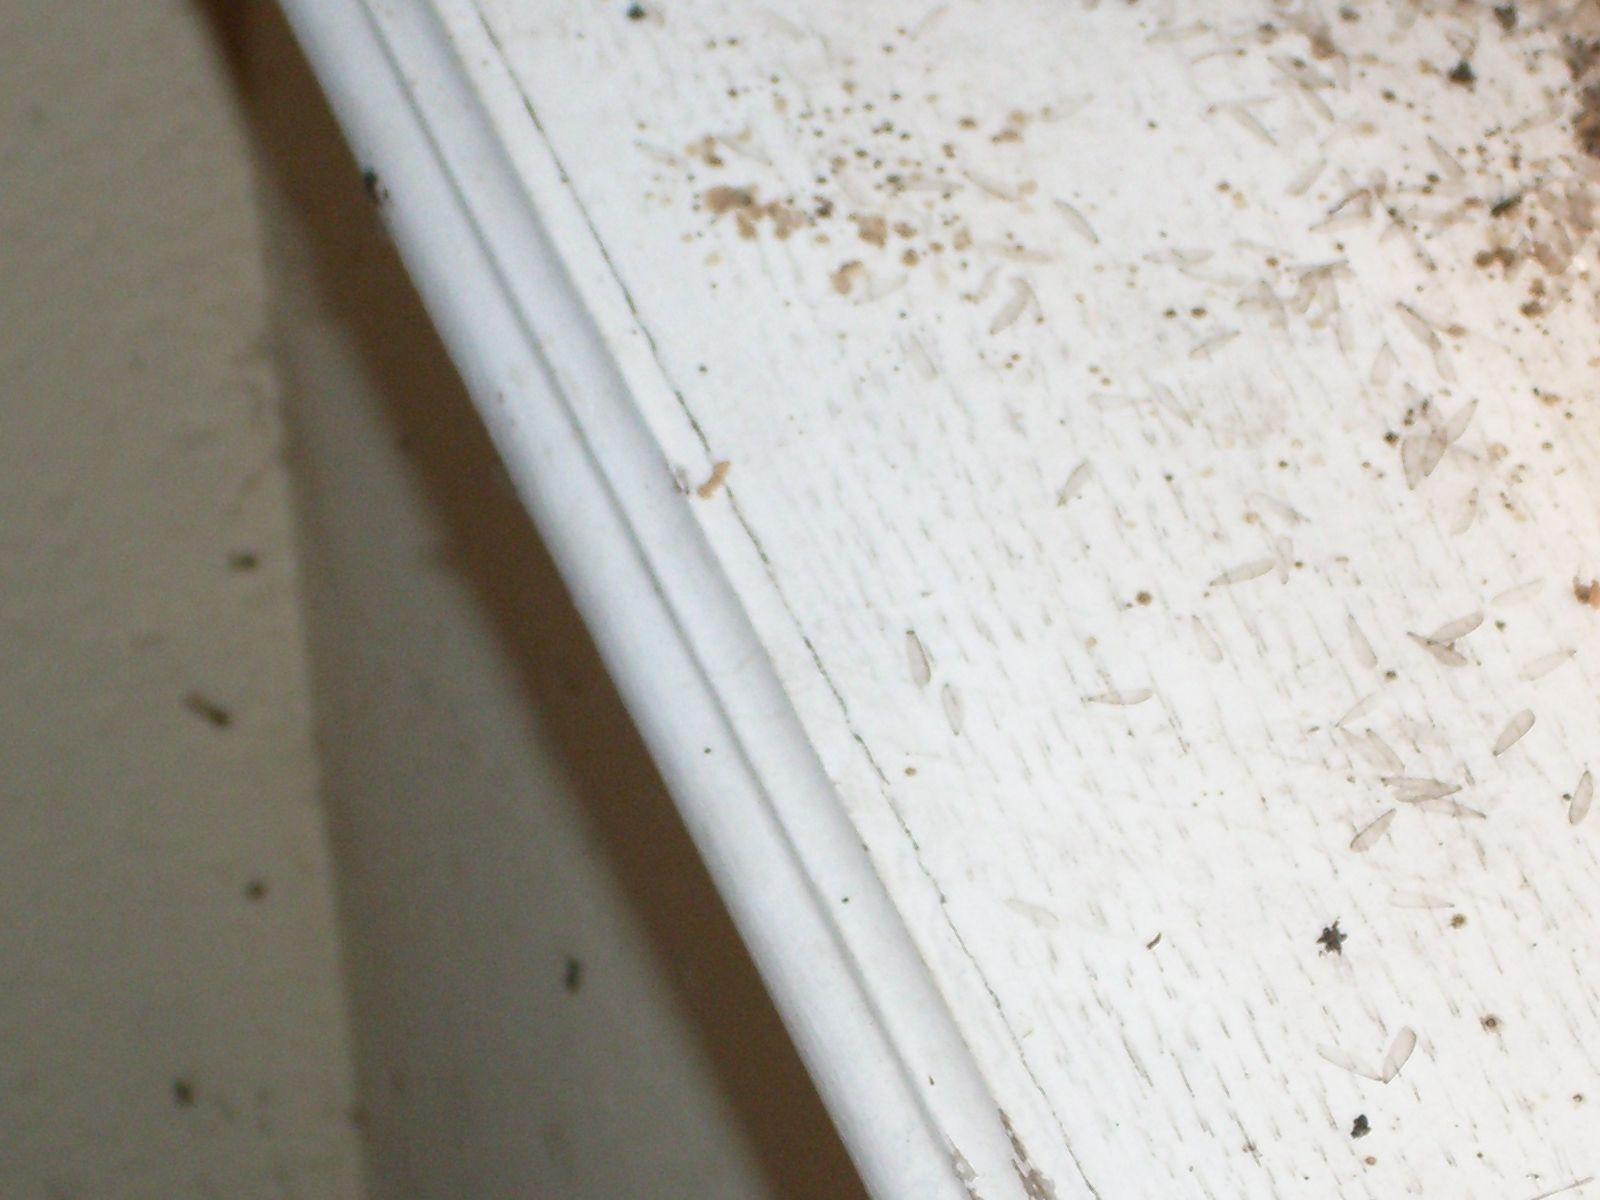 Termite Wings On Window Sill Termite Swarmers Termites Window Sill